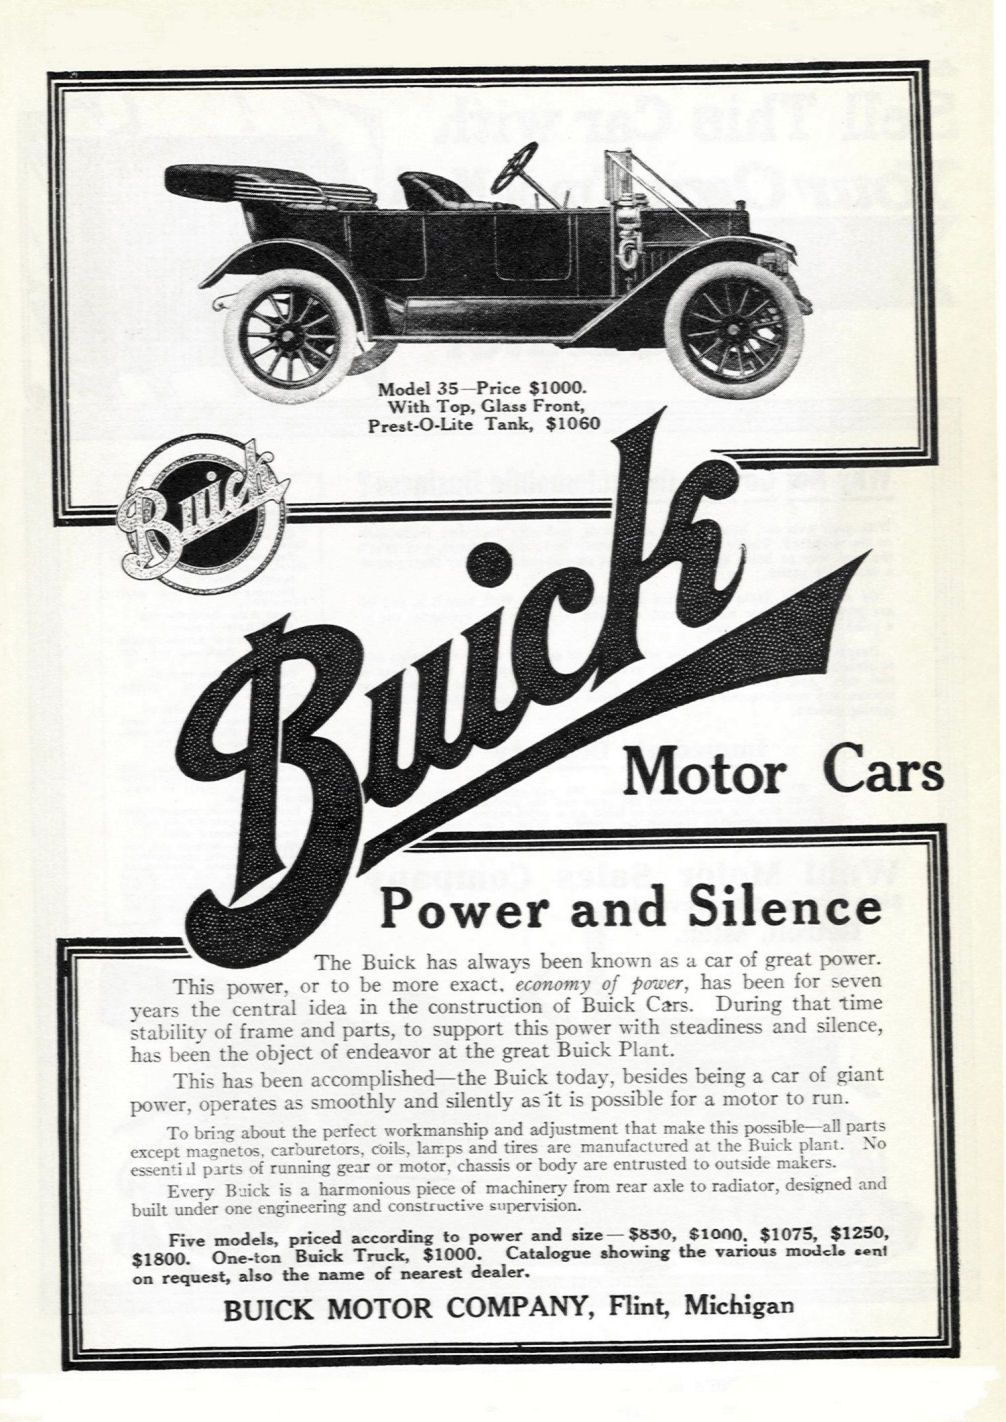 Pin By Robert Ketchum On Old Pics Americana Pinterest Ads - Nearest buick dealer